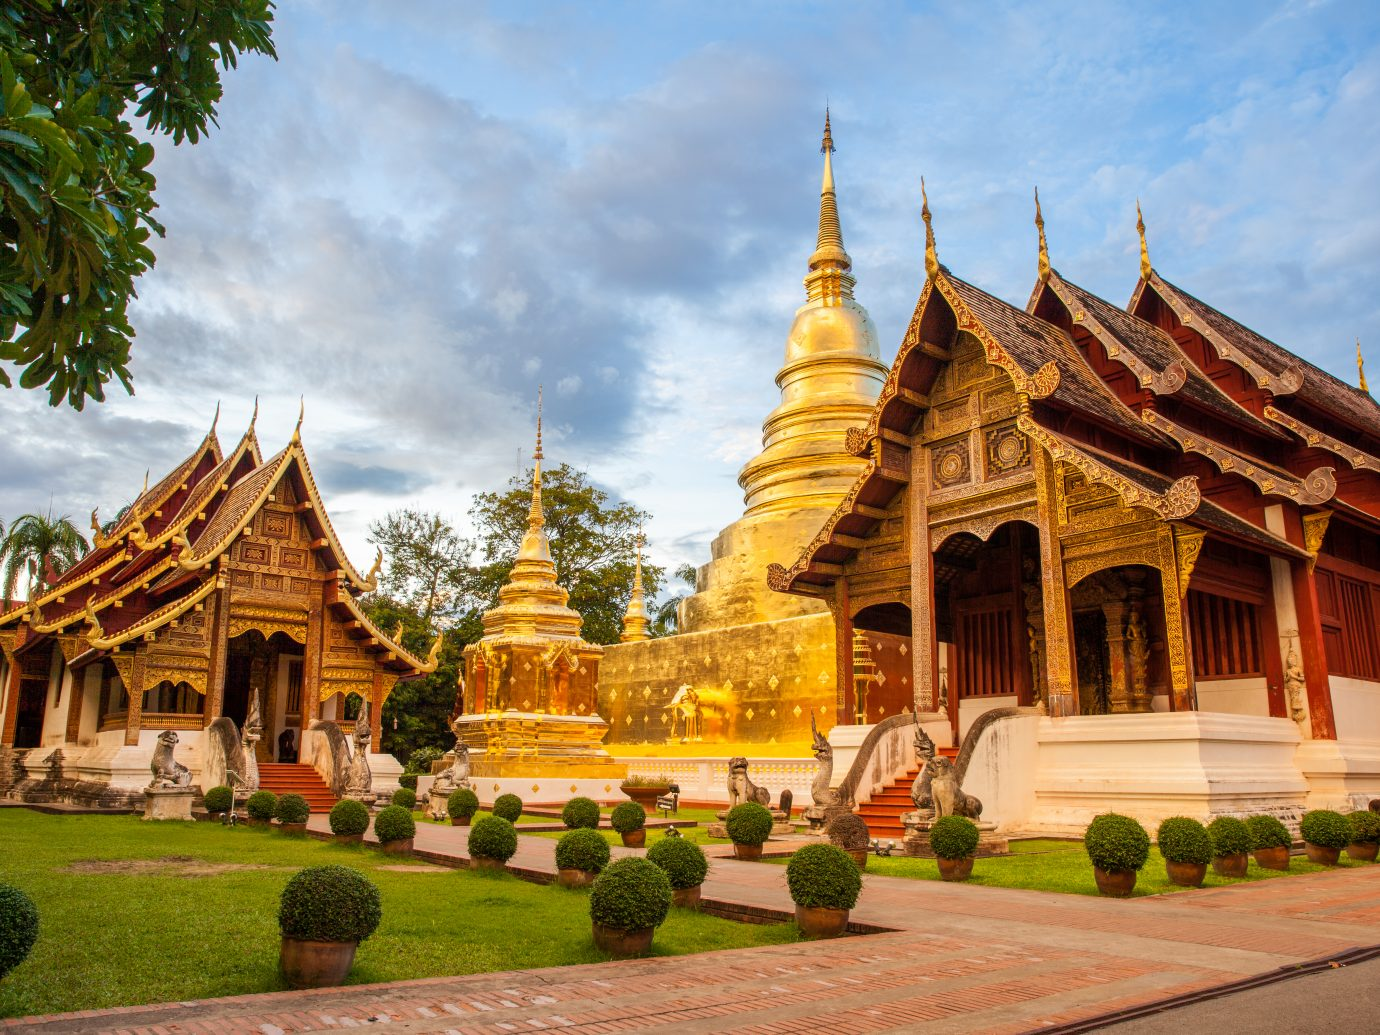 Wat Phra Singh Woramahaviharn. Buddhist temple in Chiang Mai, Thailand.